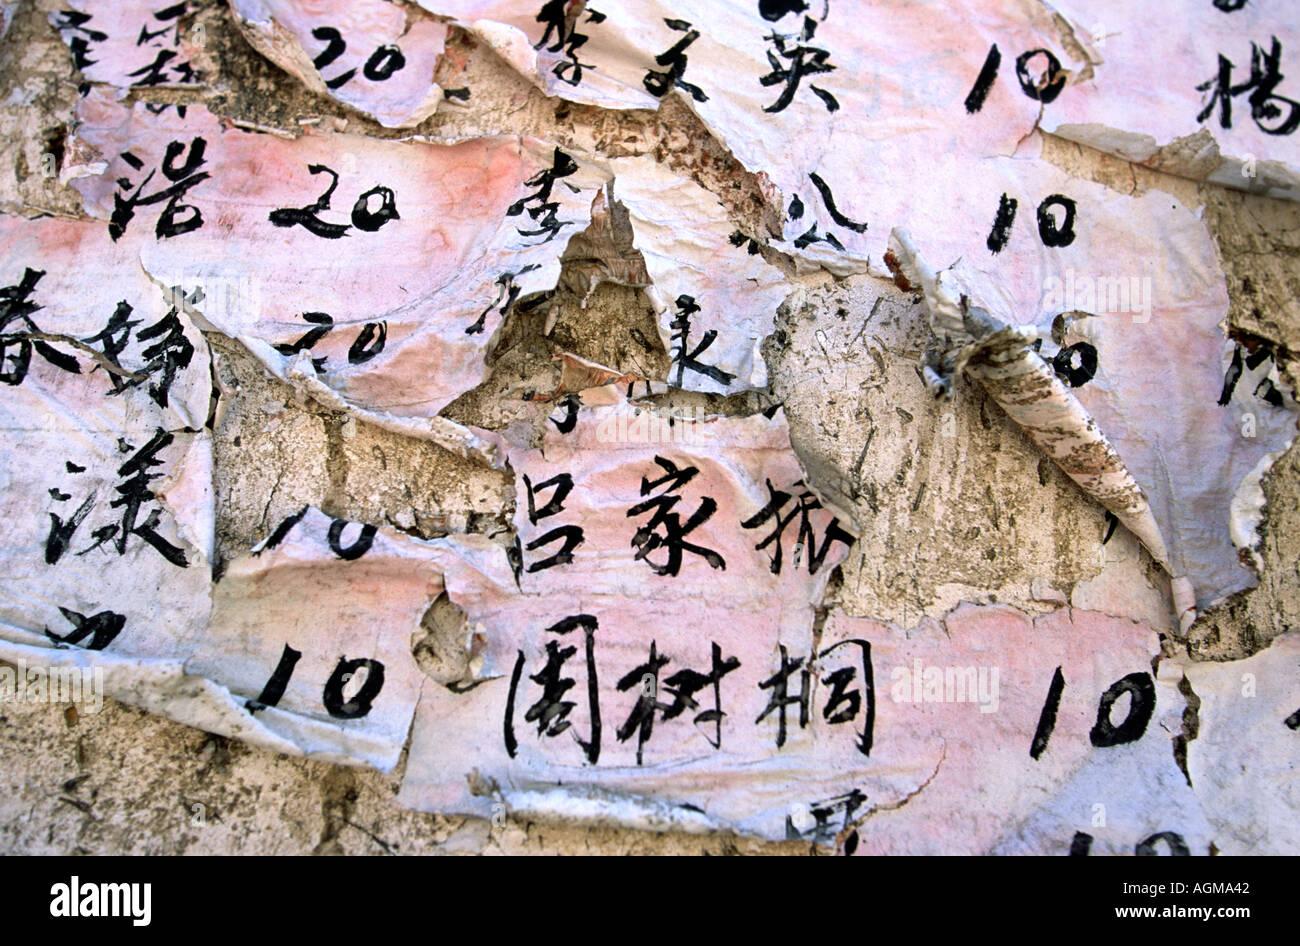 China Yunnan Lijiang old town weathered and torn wall poster - Stock Image